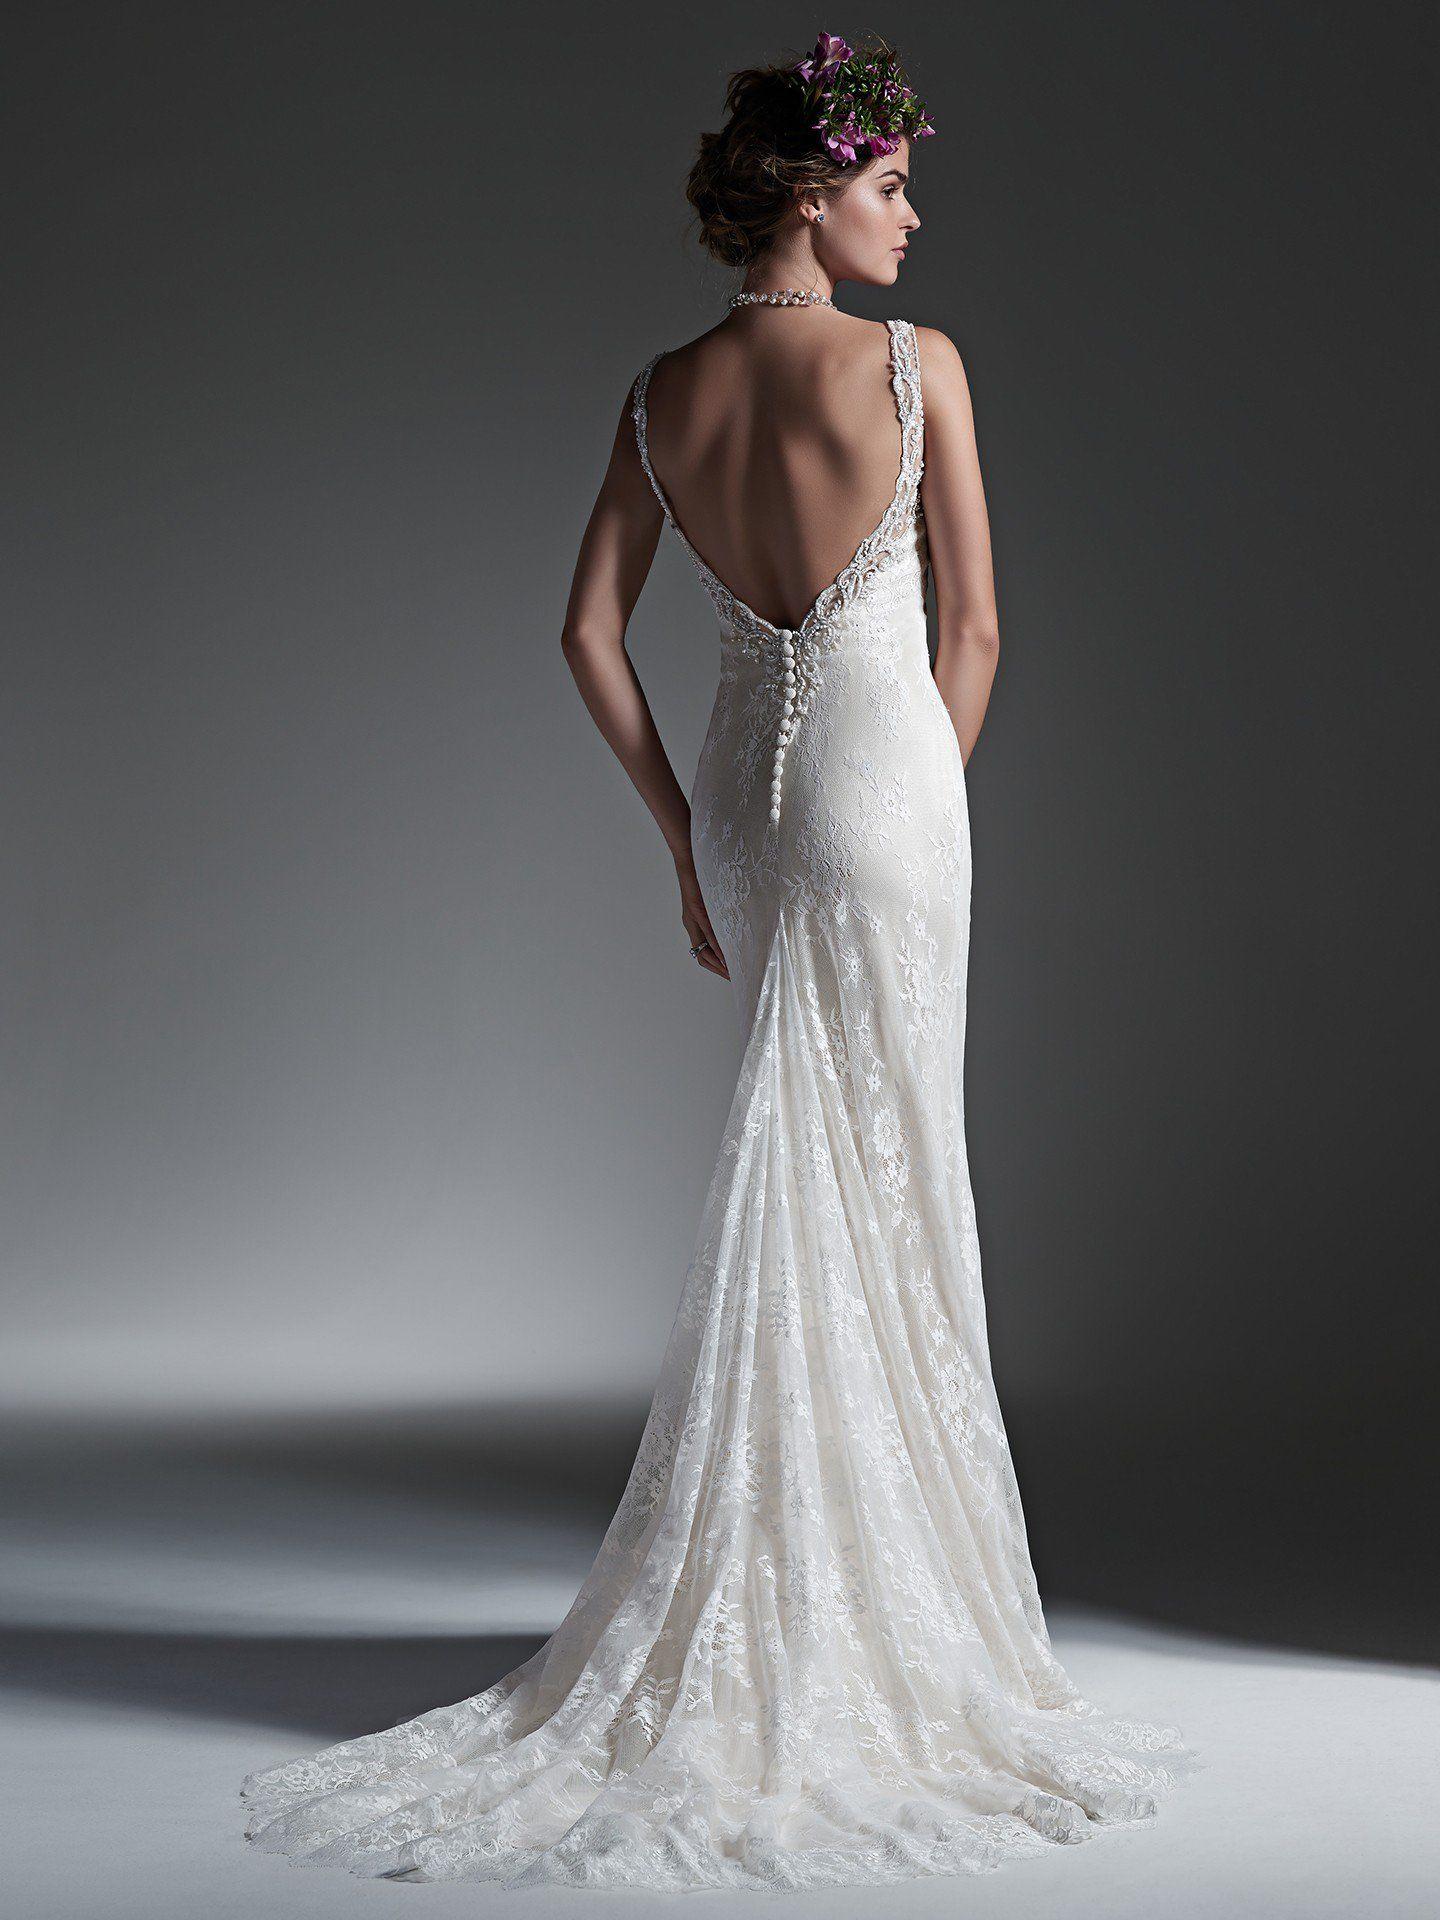 Minimal Lace Wedding Dress Perri By Sottero And Midgley